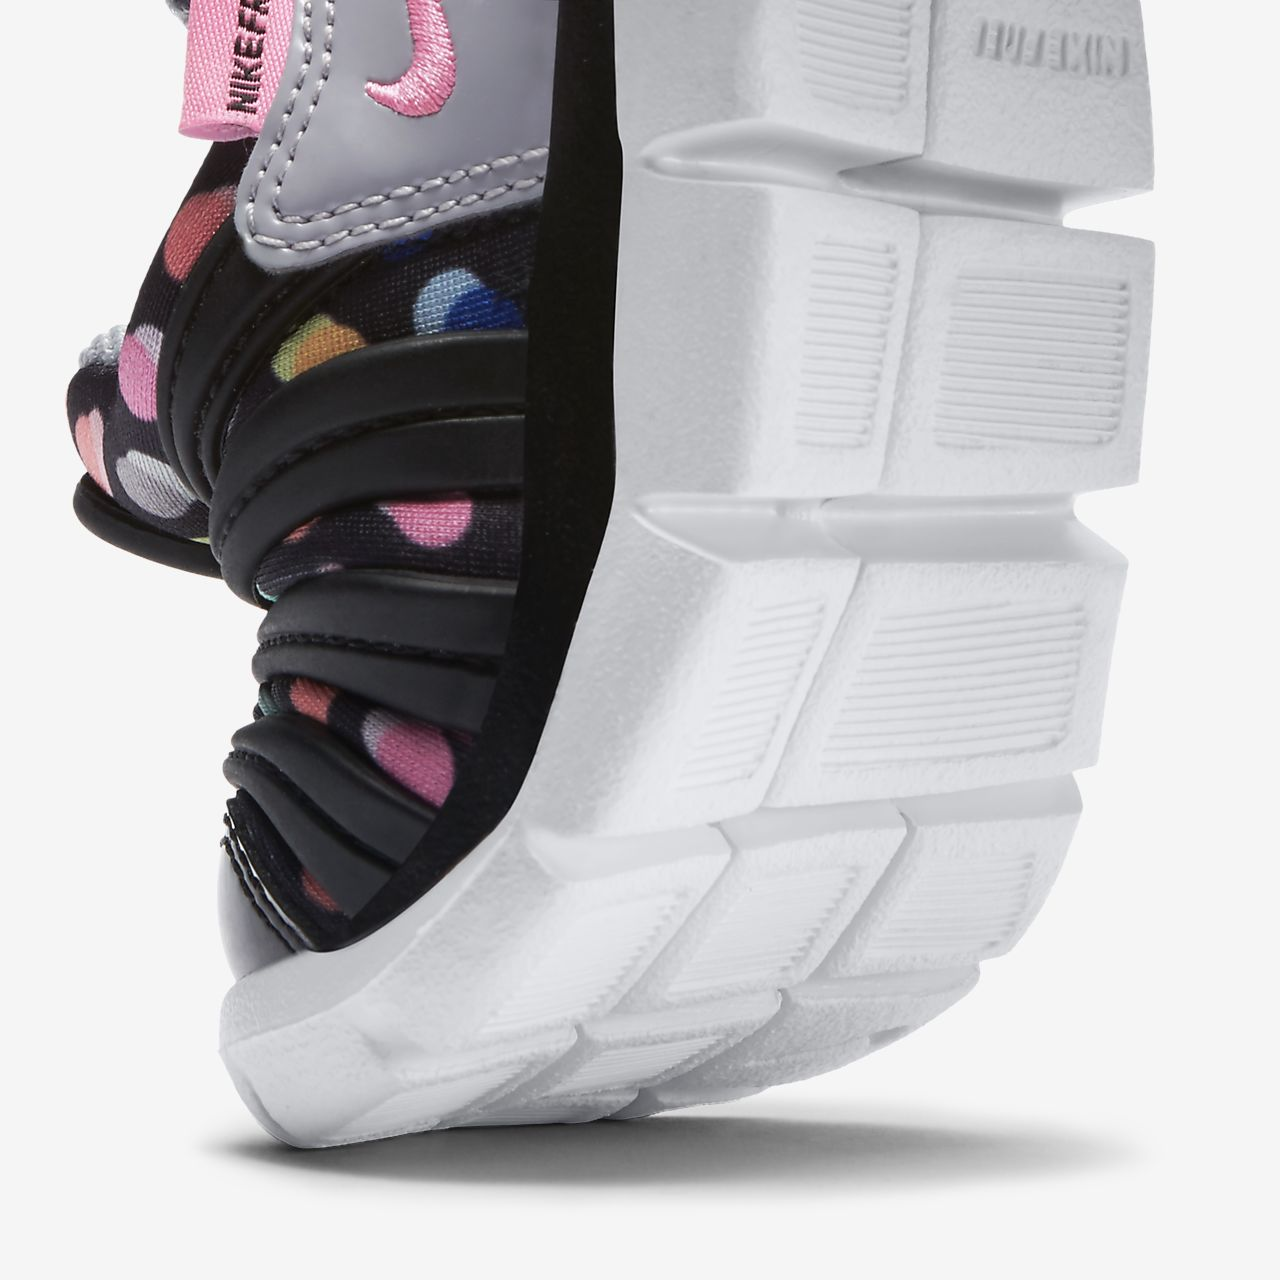 gris rosado nike free dynamo hombres zapatos